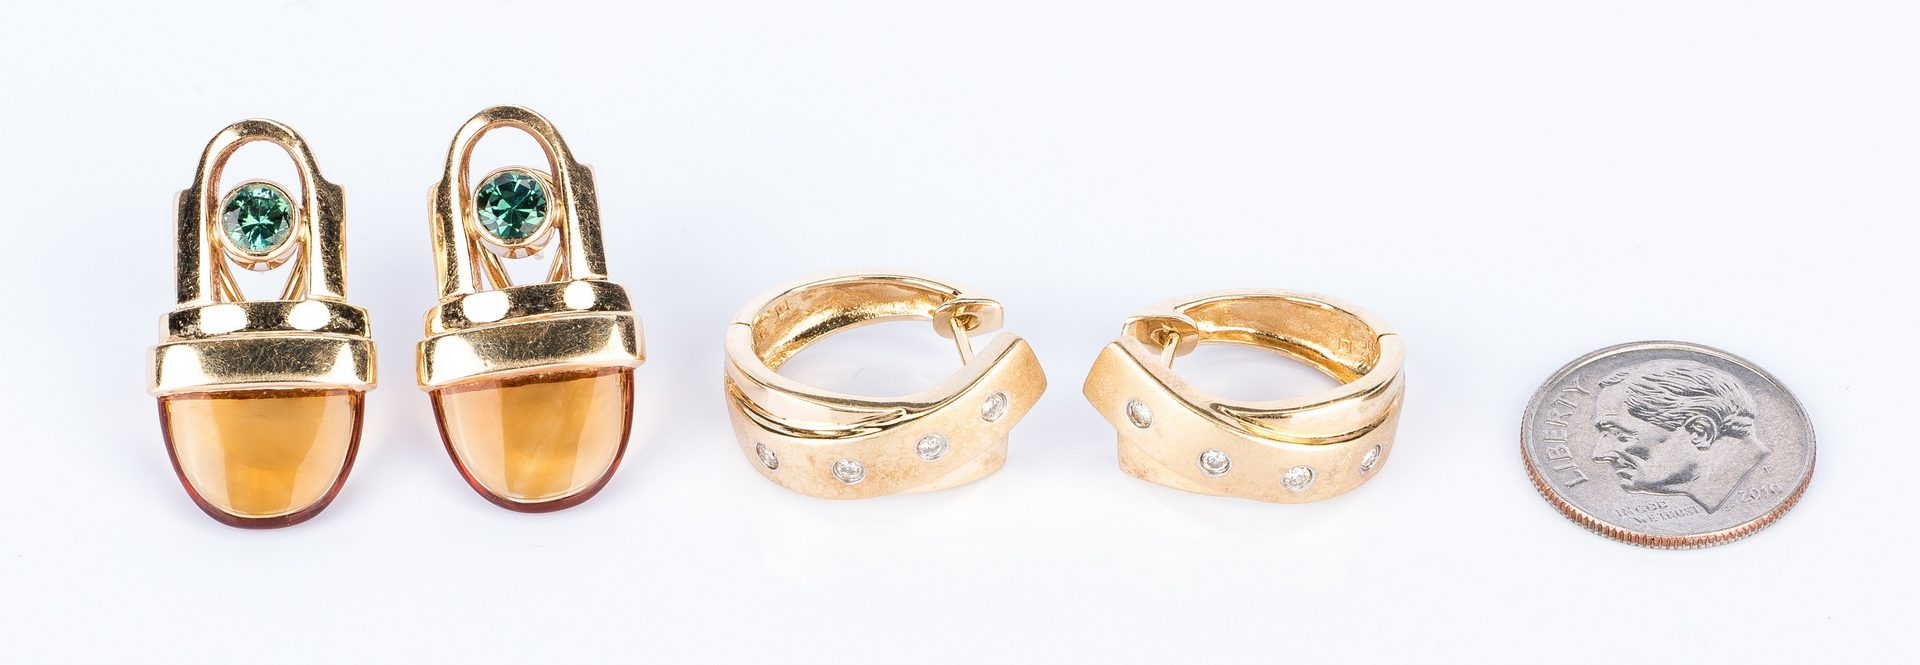 Lot 447: 2 Pr Designer Earrings incl. Piaget